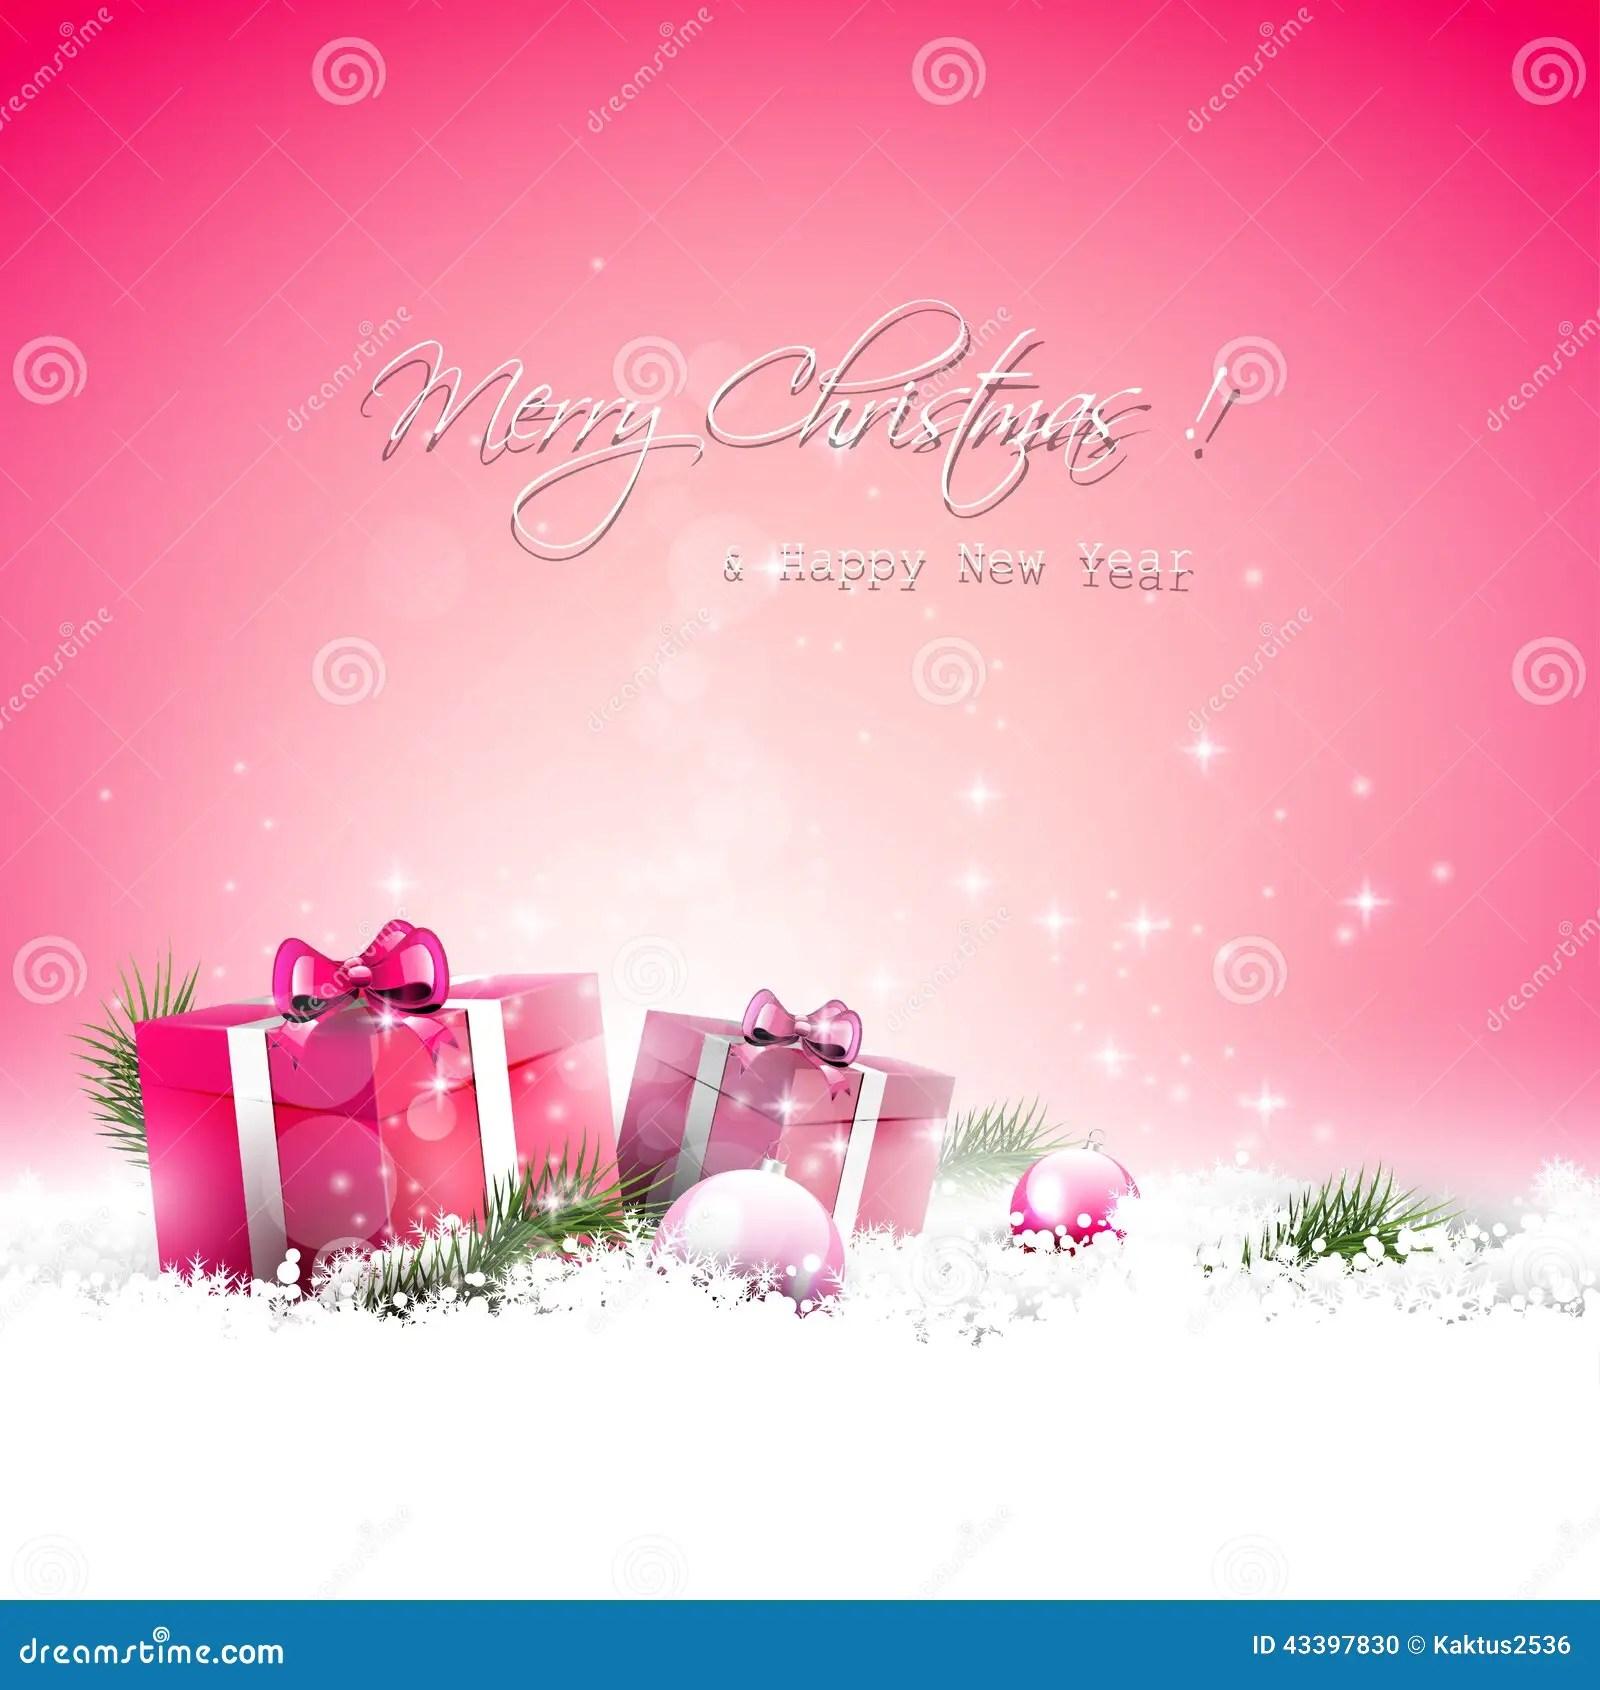 Pink Christmas Greeting Card Stock Photo Image 43397830